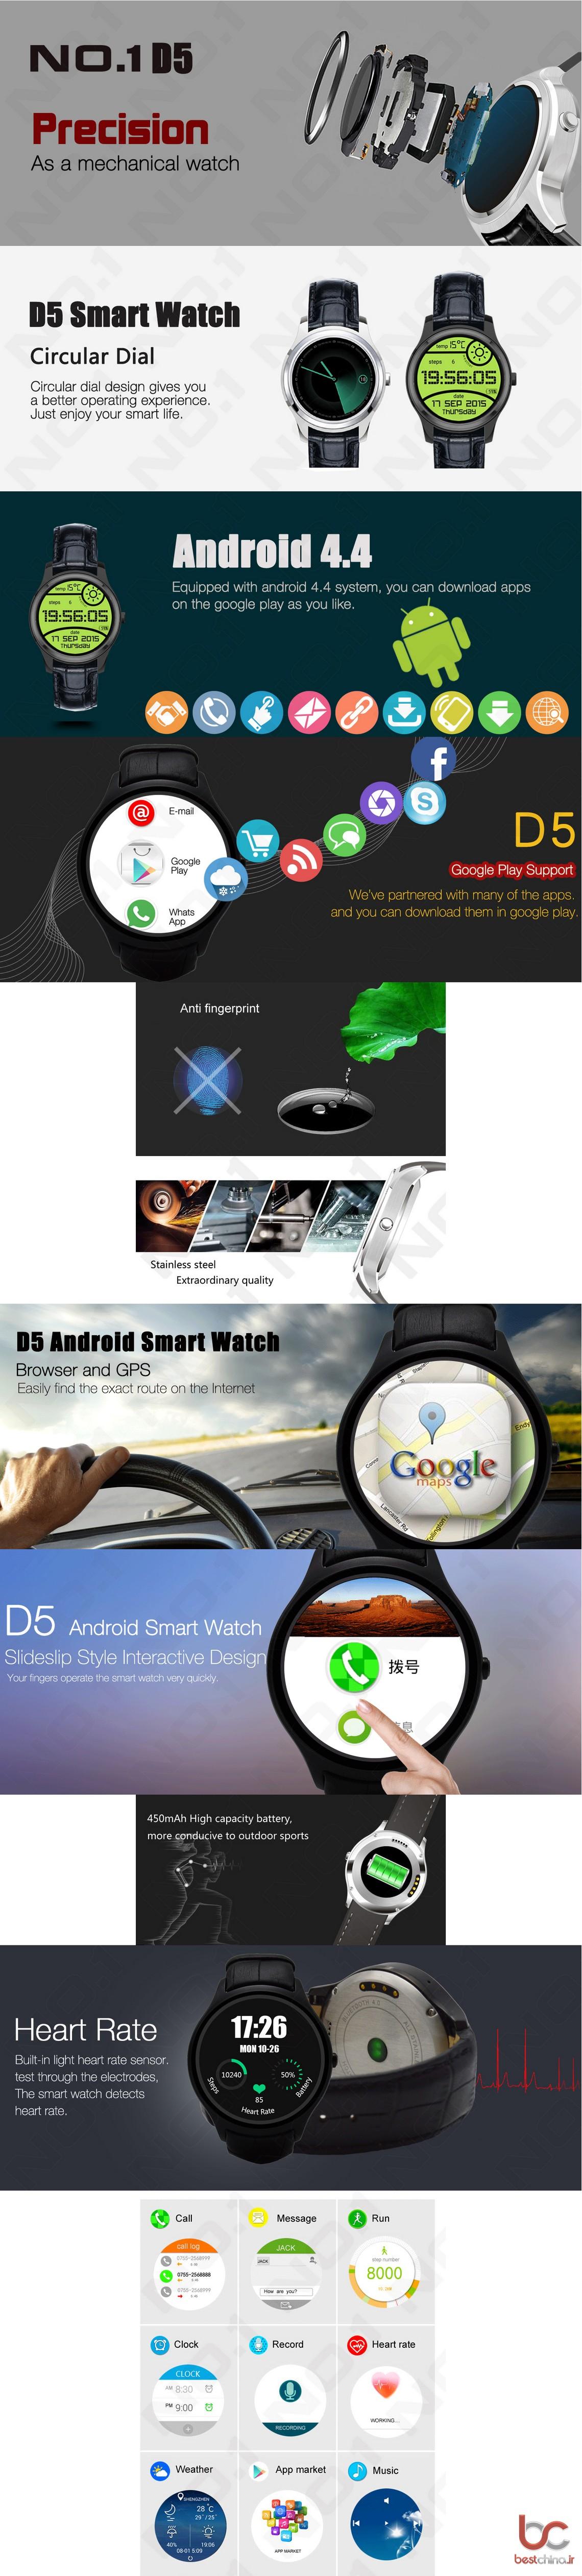 NO.1 D5 smartwatch (3)